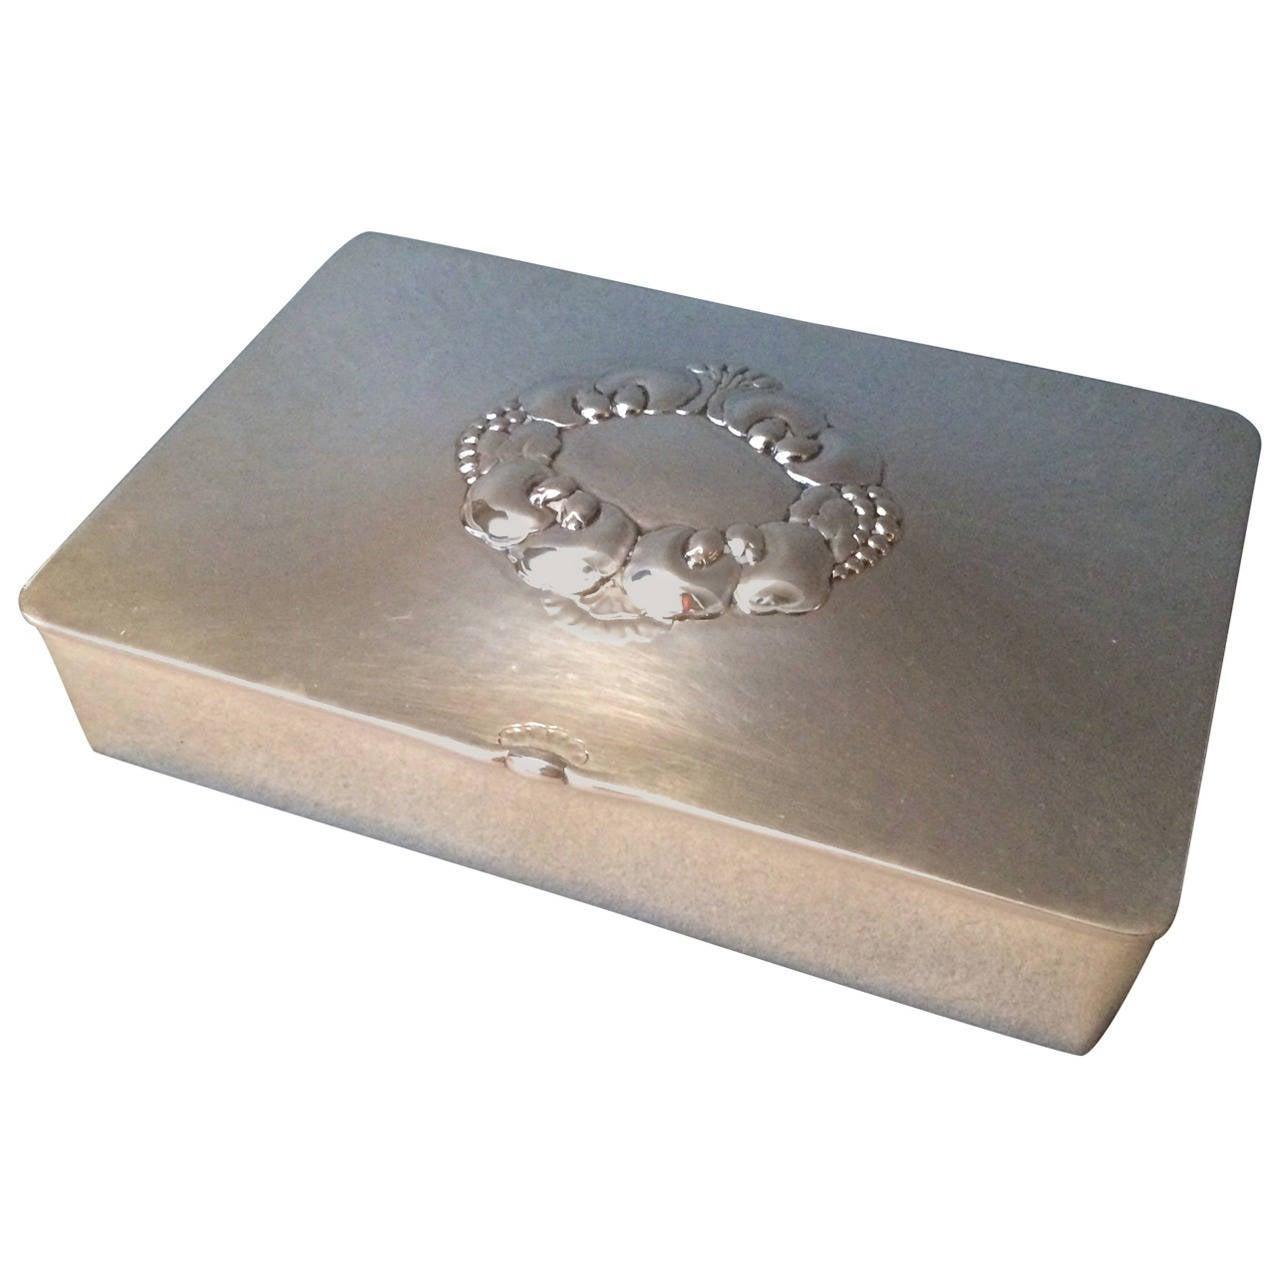 georg jensen keepsake box no 507a by gundorph albertus at 1stdibs. Black Bedroom Furniture Sets. Home Design Ideas